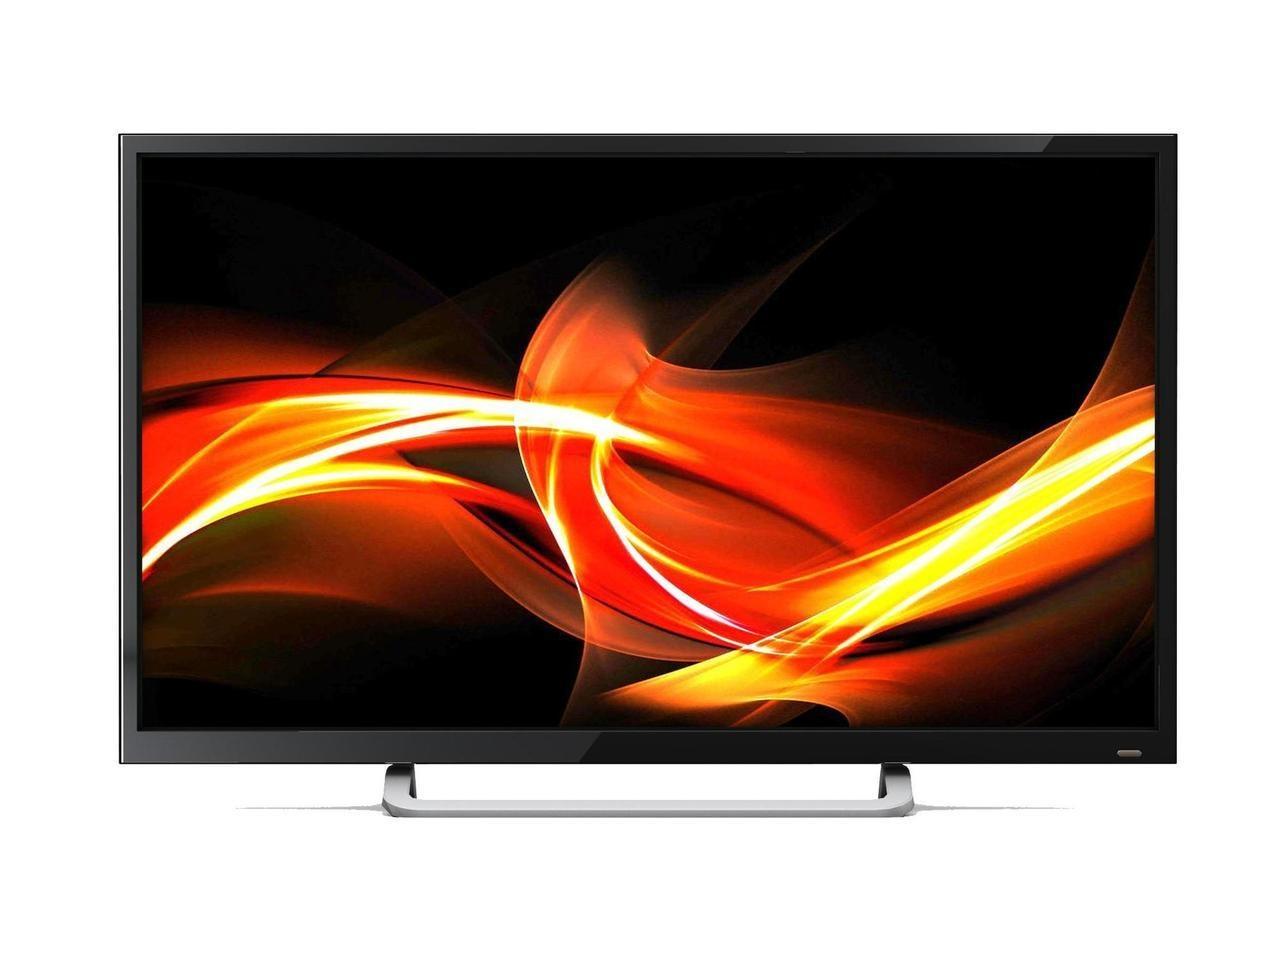 System: Auflösung: 1920x1080 (Full-HD) Hintergrundbeleuchtung: LED Helligkeit: 300cd / m2 Kontrast: 1200: 1 Öffnungswinkel: 178 ° horizontal & vertikal Reaktionszeit: 5ms Farben: 16,7M Eingang: 1xVGA (D-Sub) / 2xHDMI / 1xAudio Ausgang : 1x Sprecher Allgem